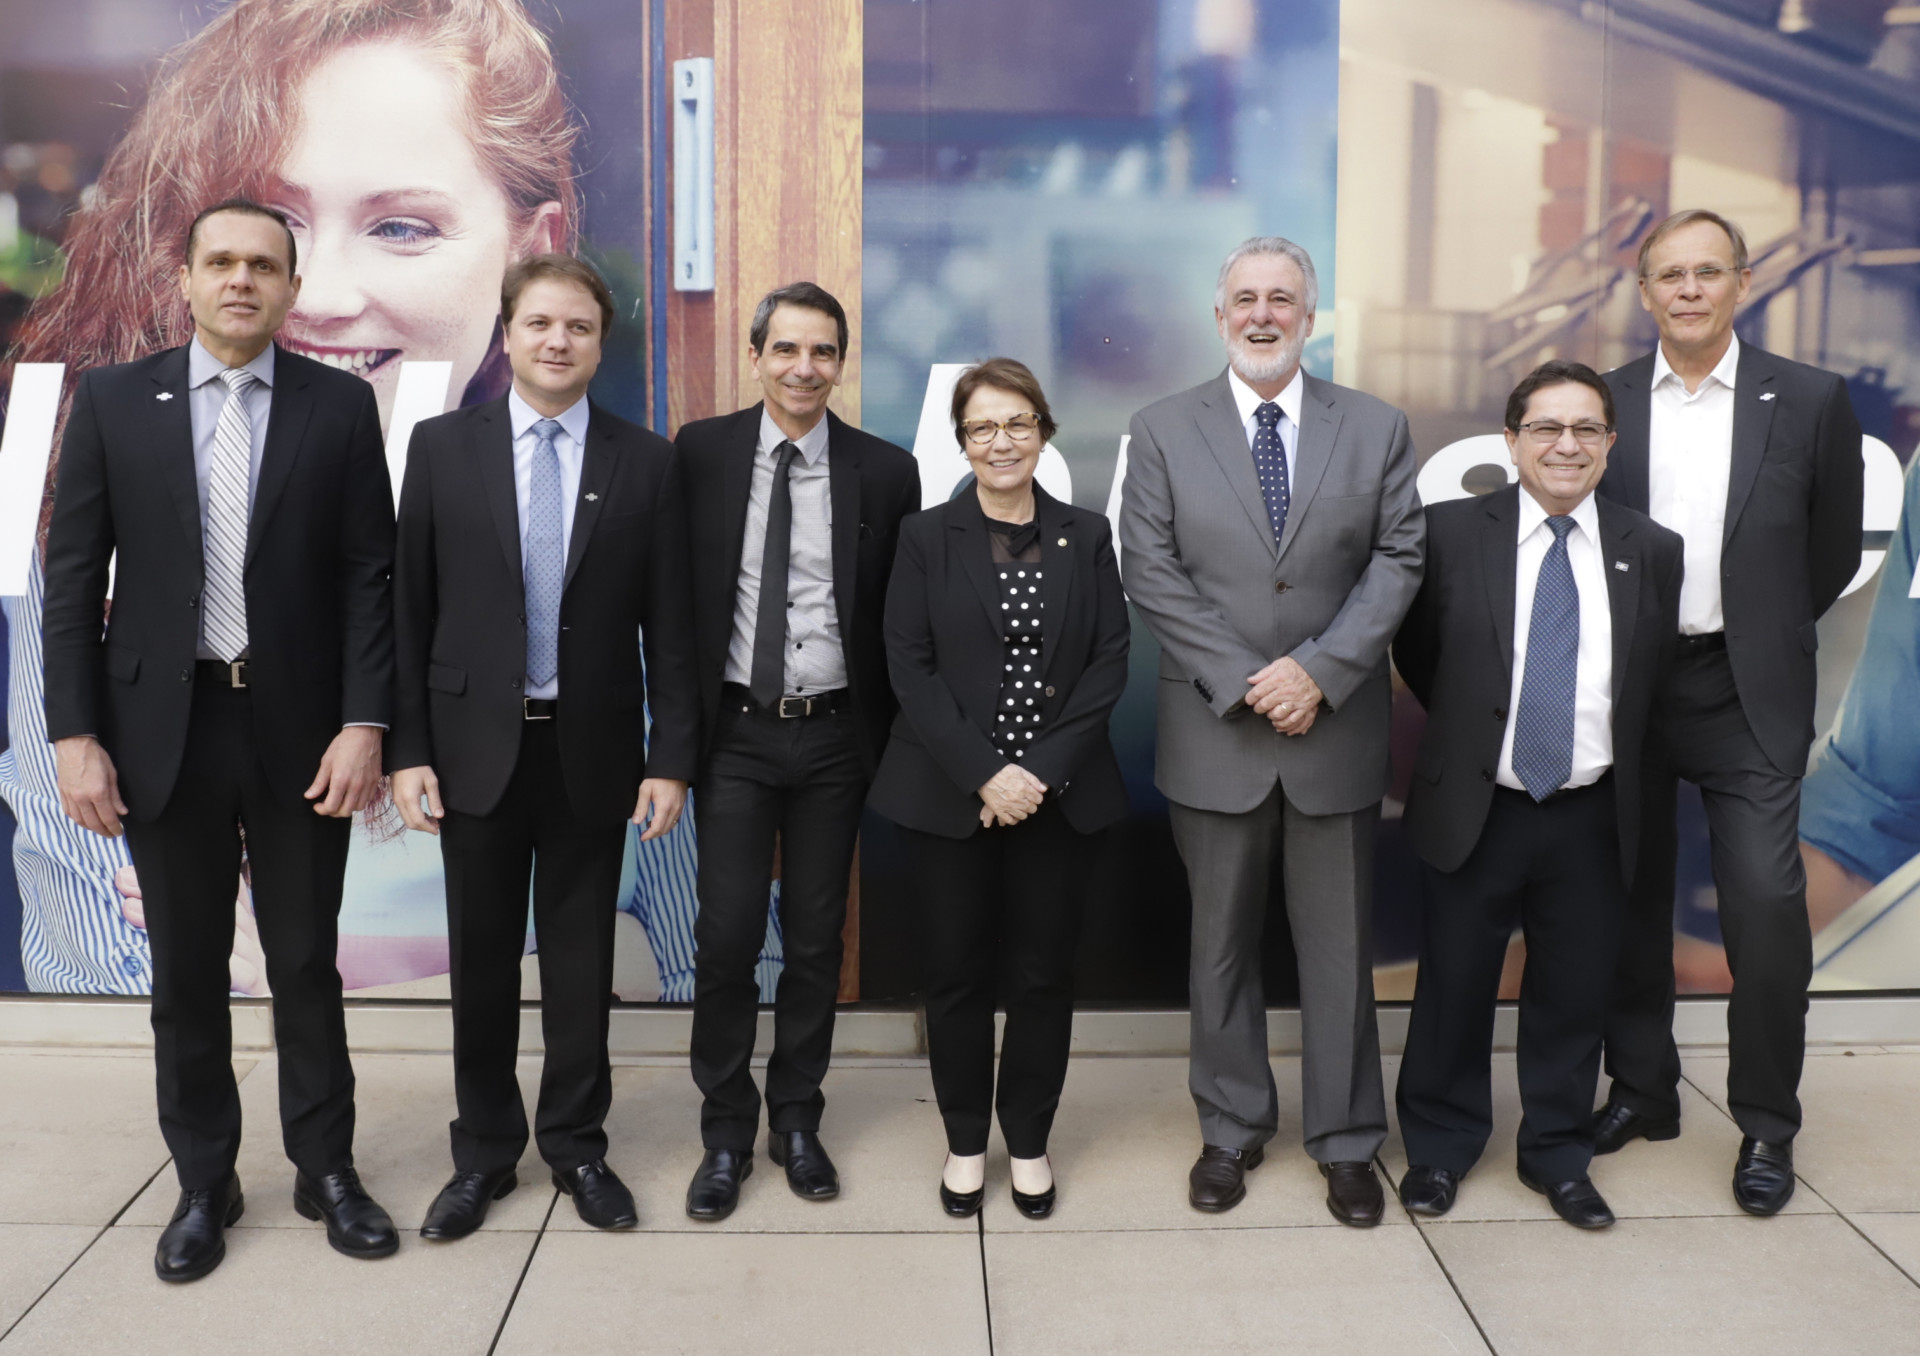 A ministra da Agricultura, Pecuária e Abastecimento (MAPA), Tereza Cristina, visitou o Sebrae Nacional